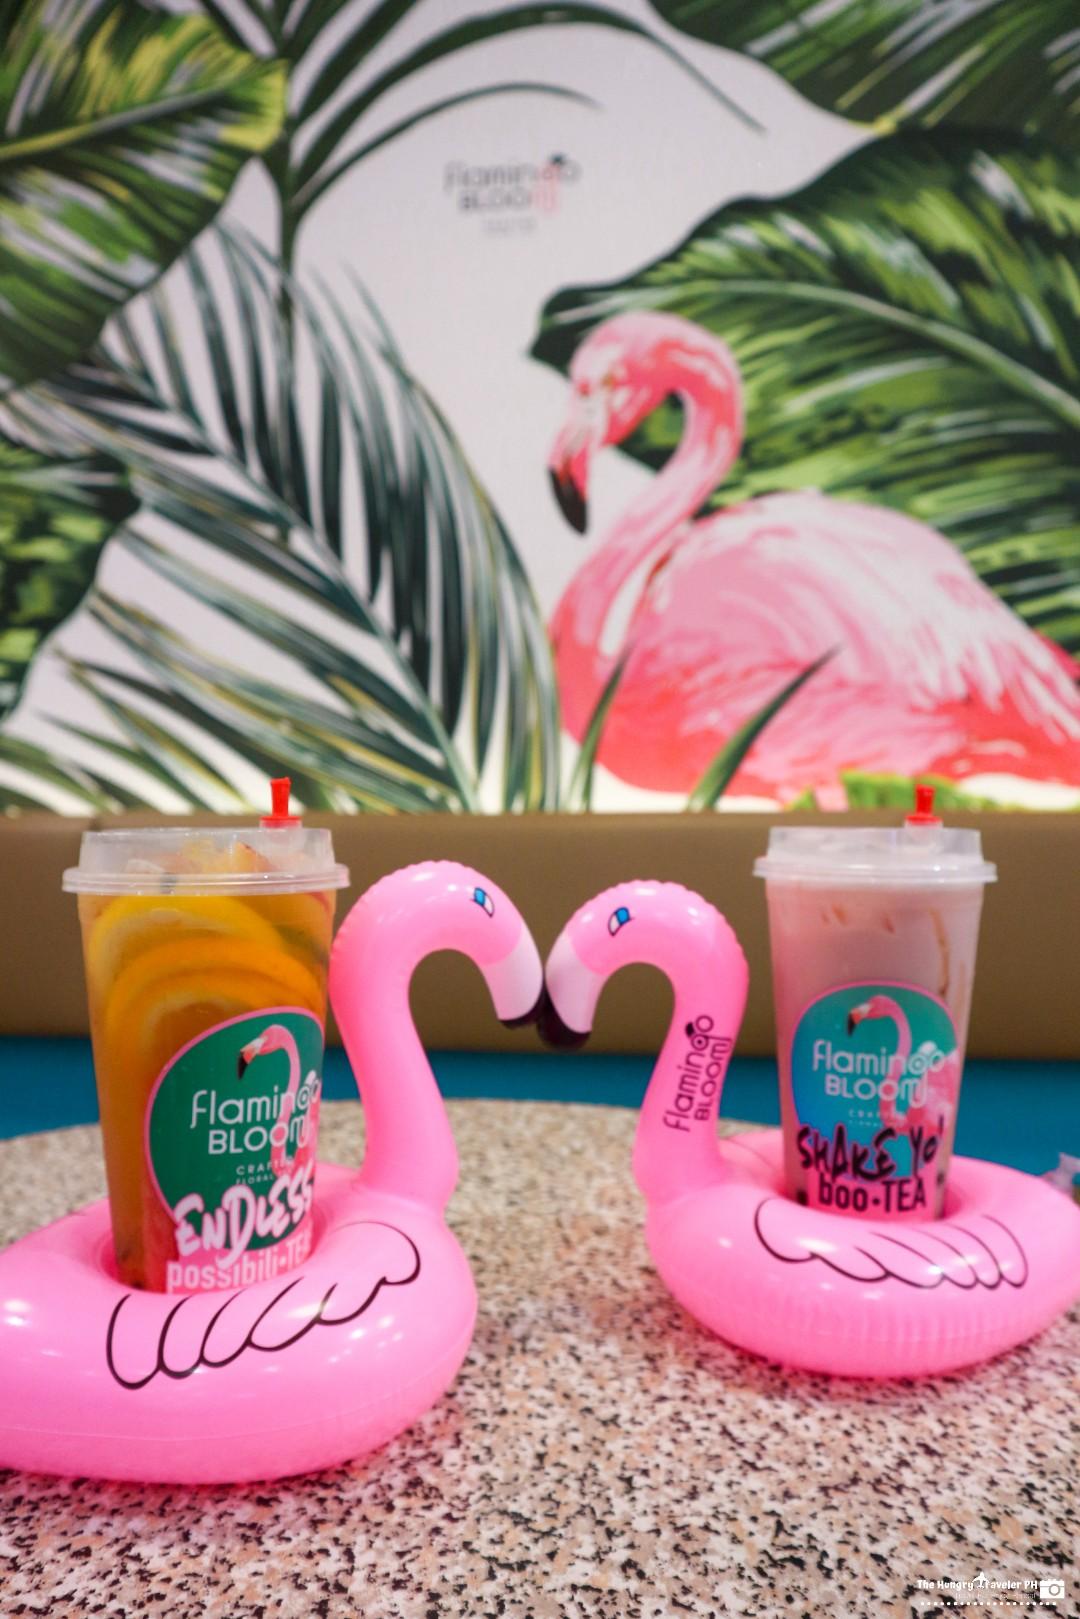 flamingo bloom philippines